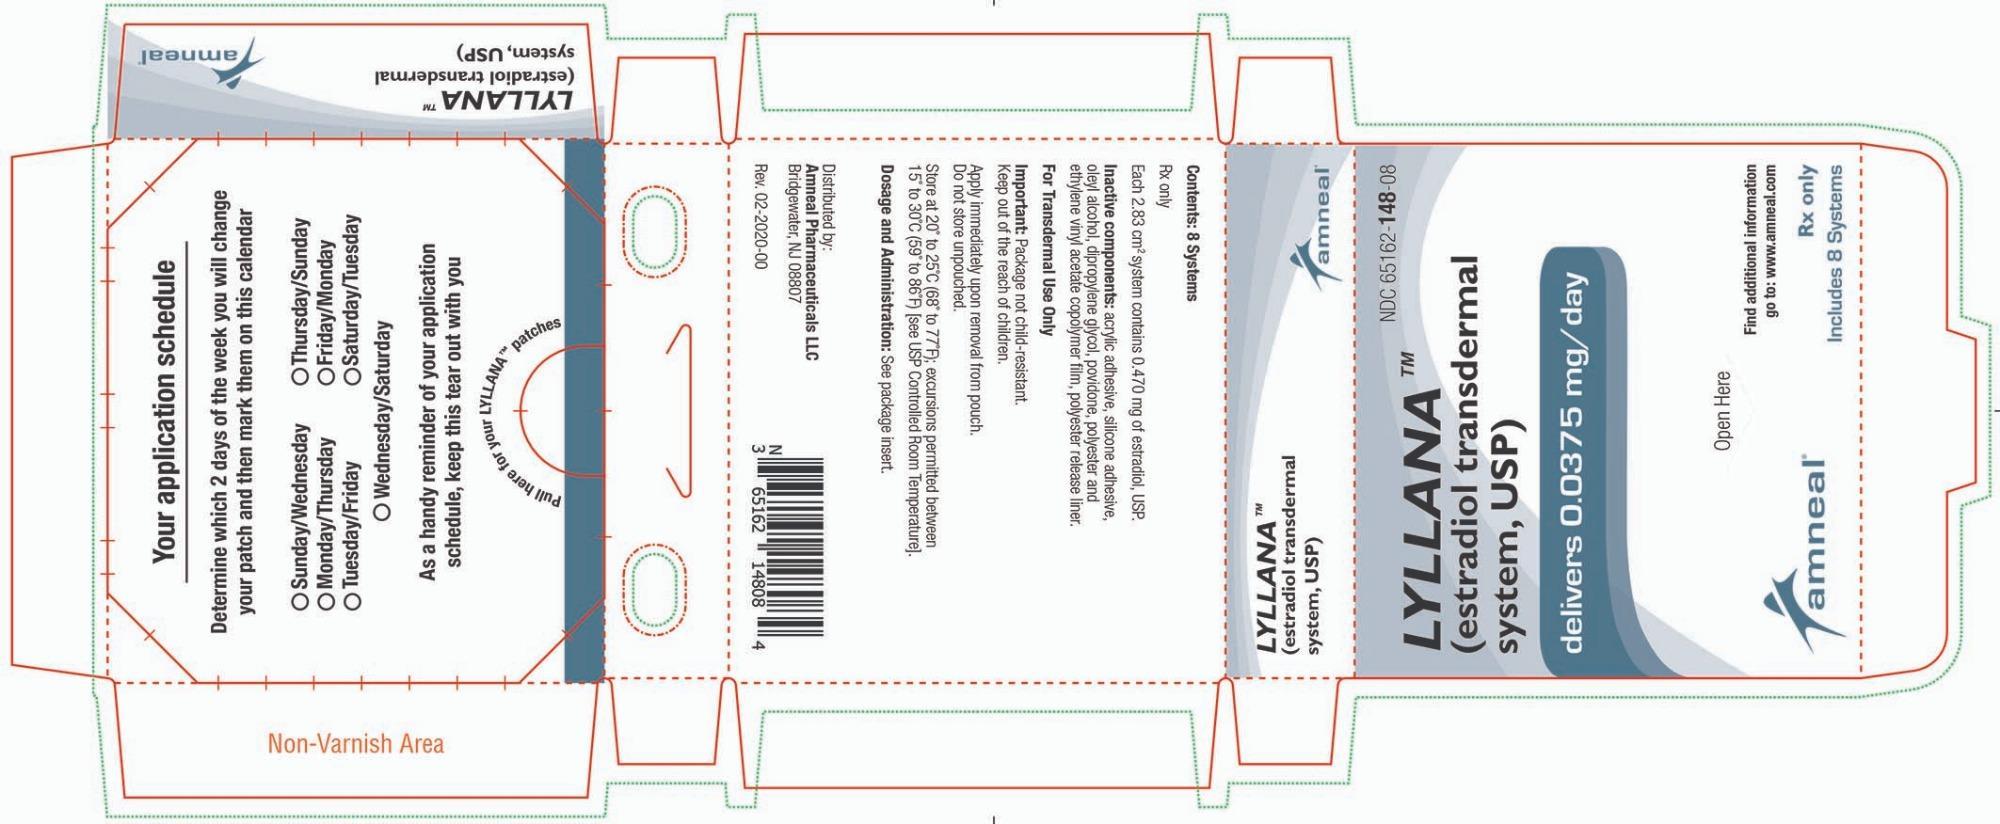 0.0375 mg/day carton